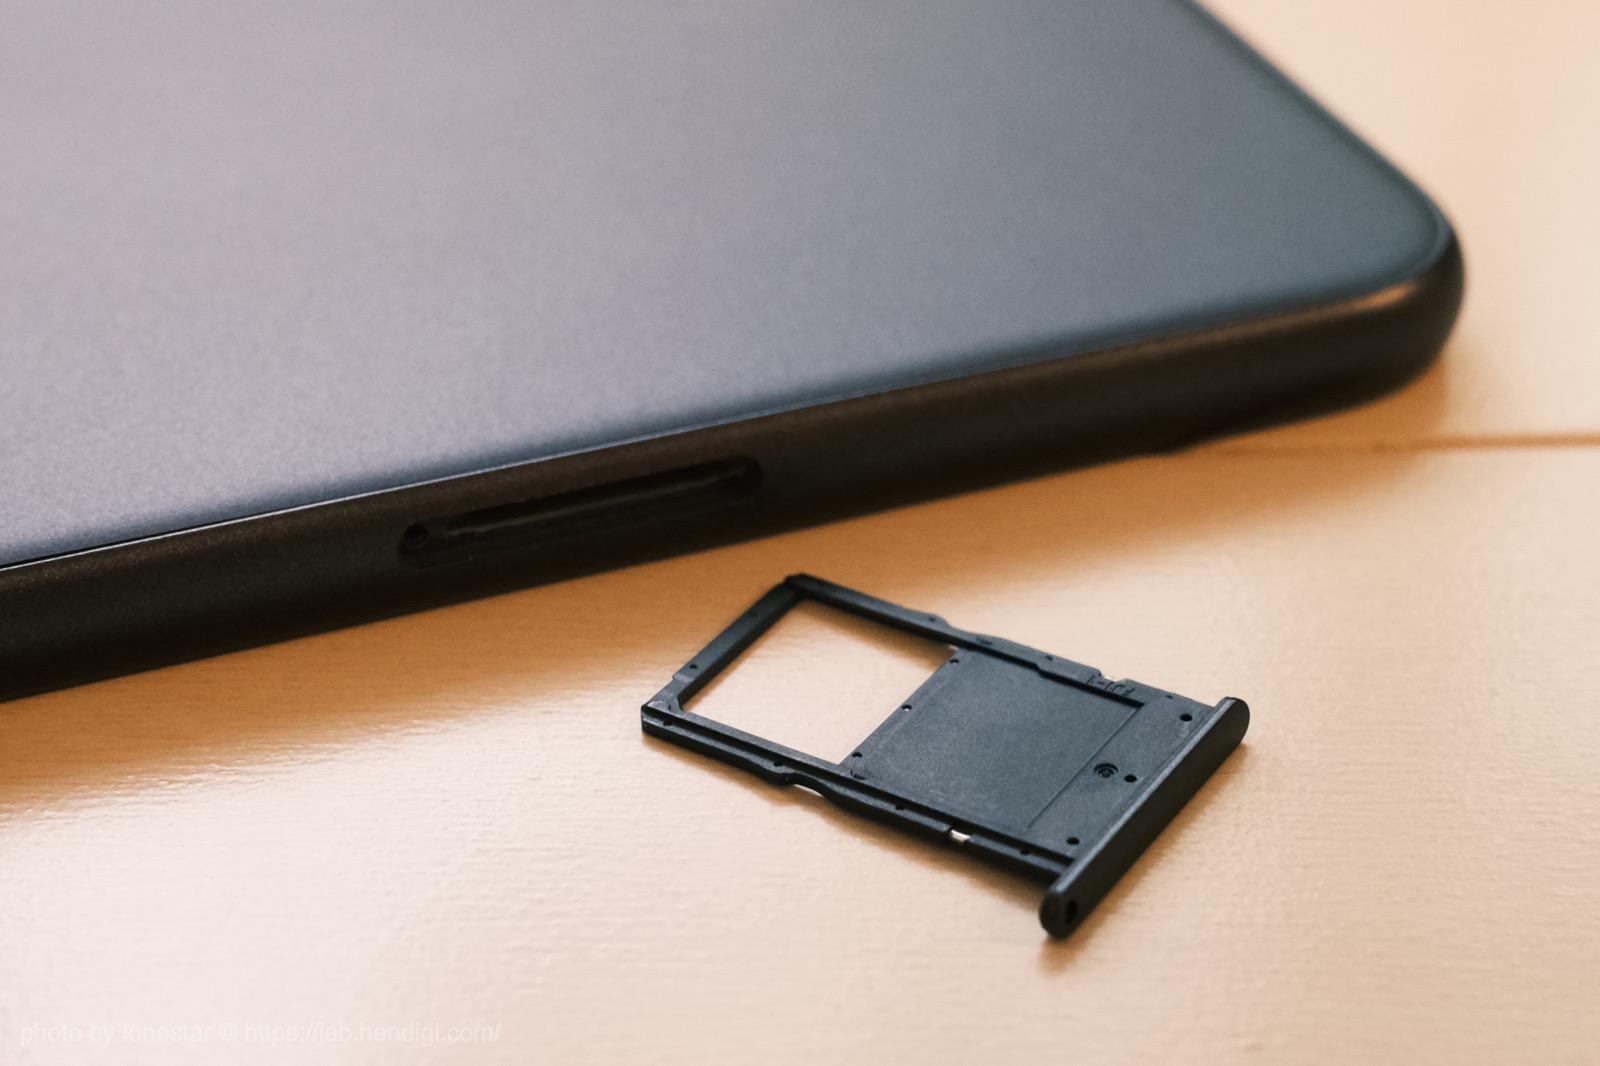 HUAWEI MatePad Pro NMカード